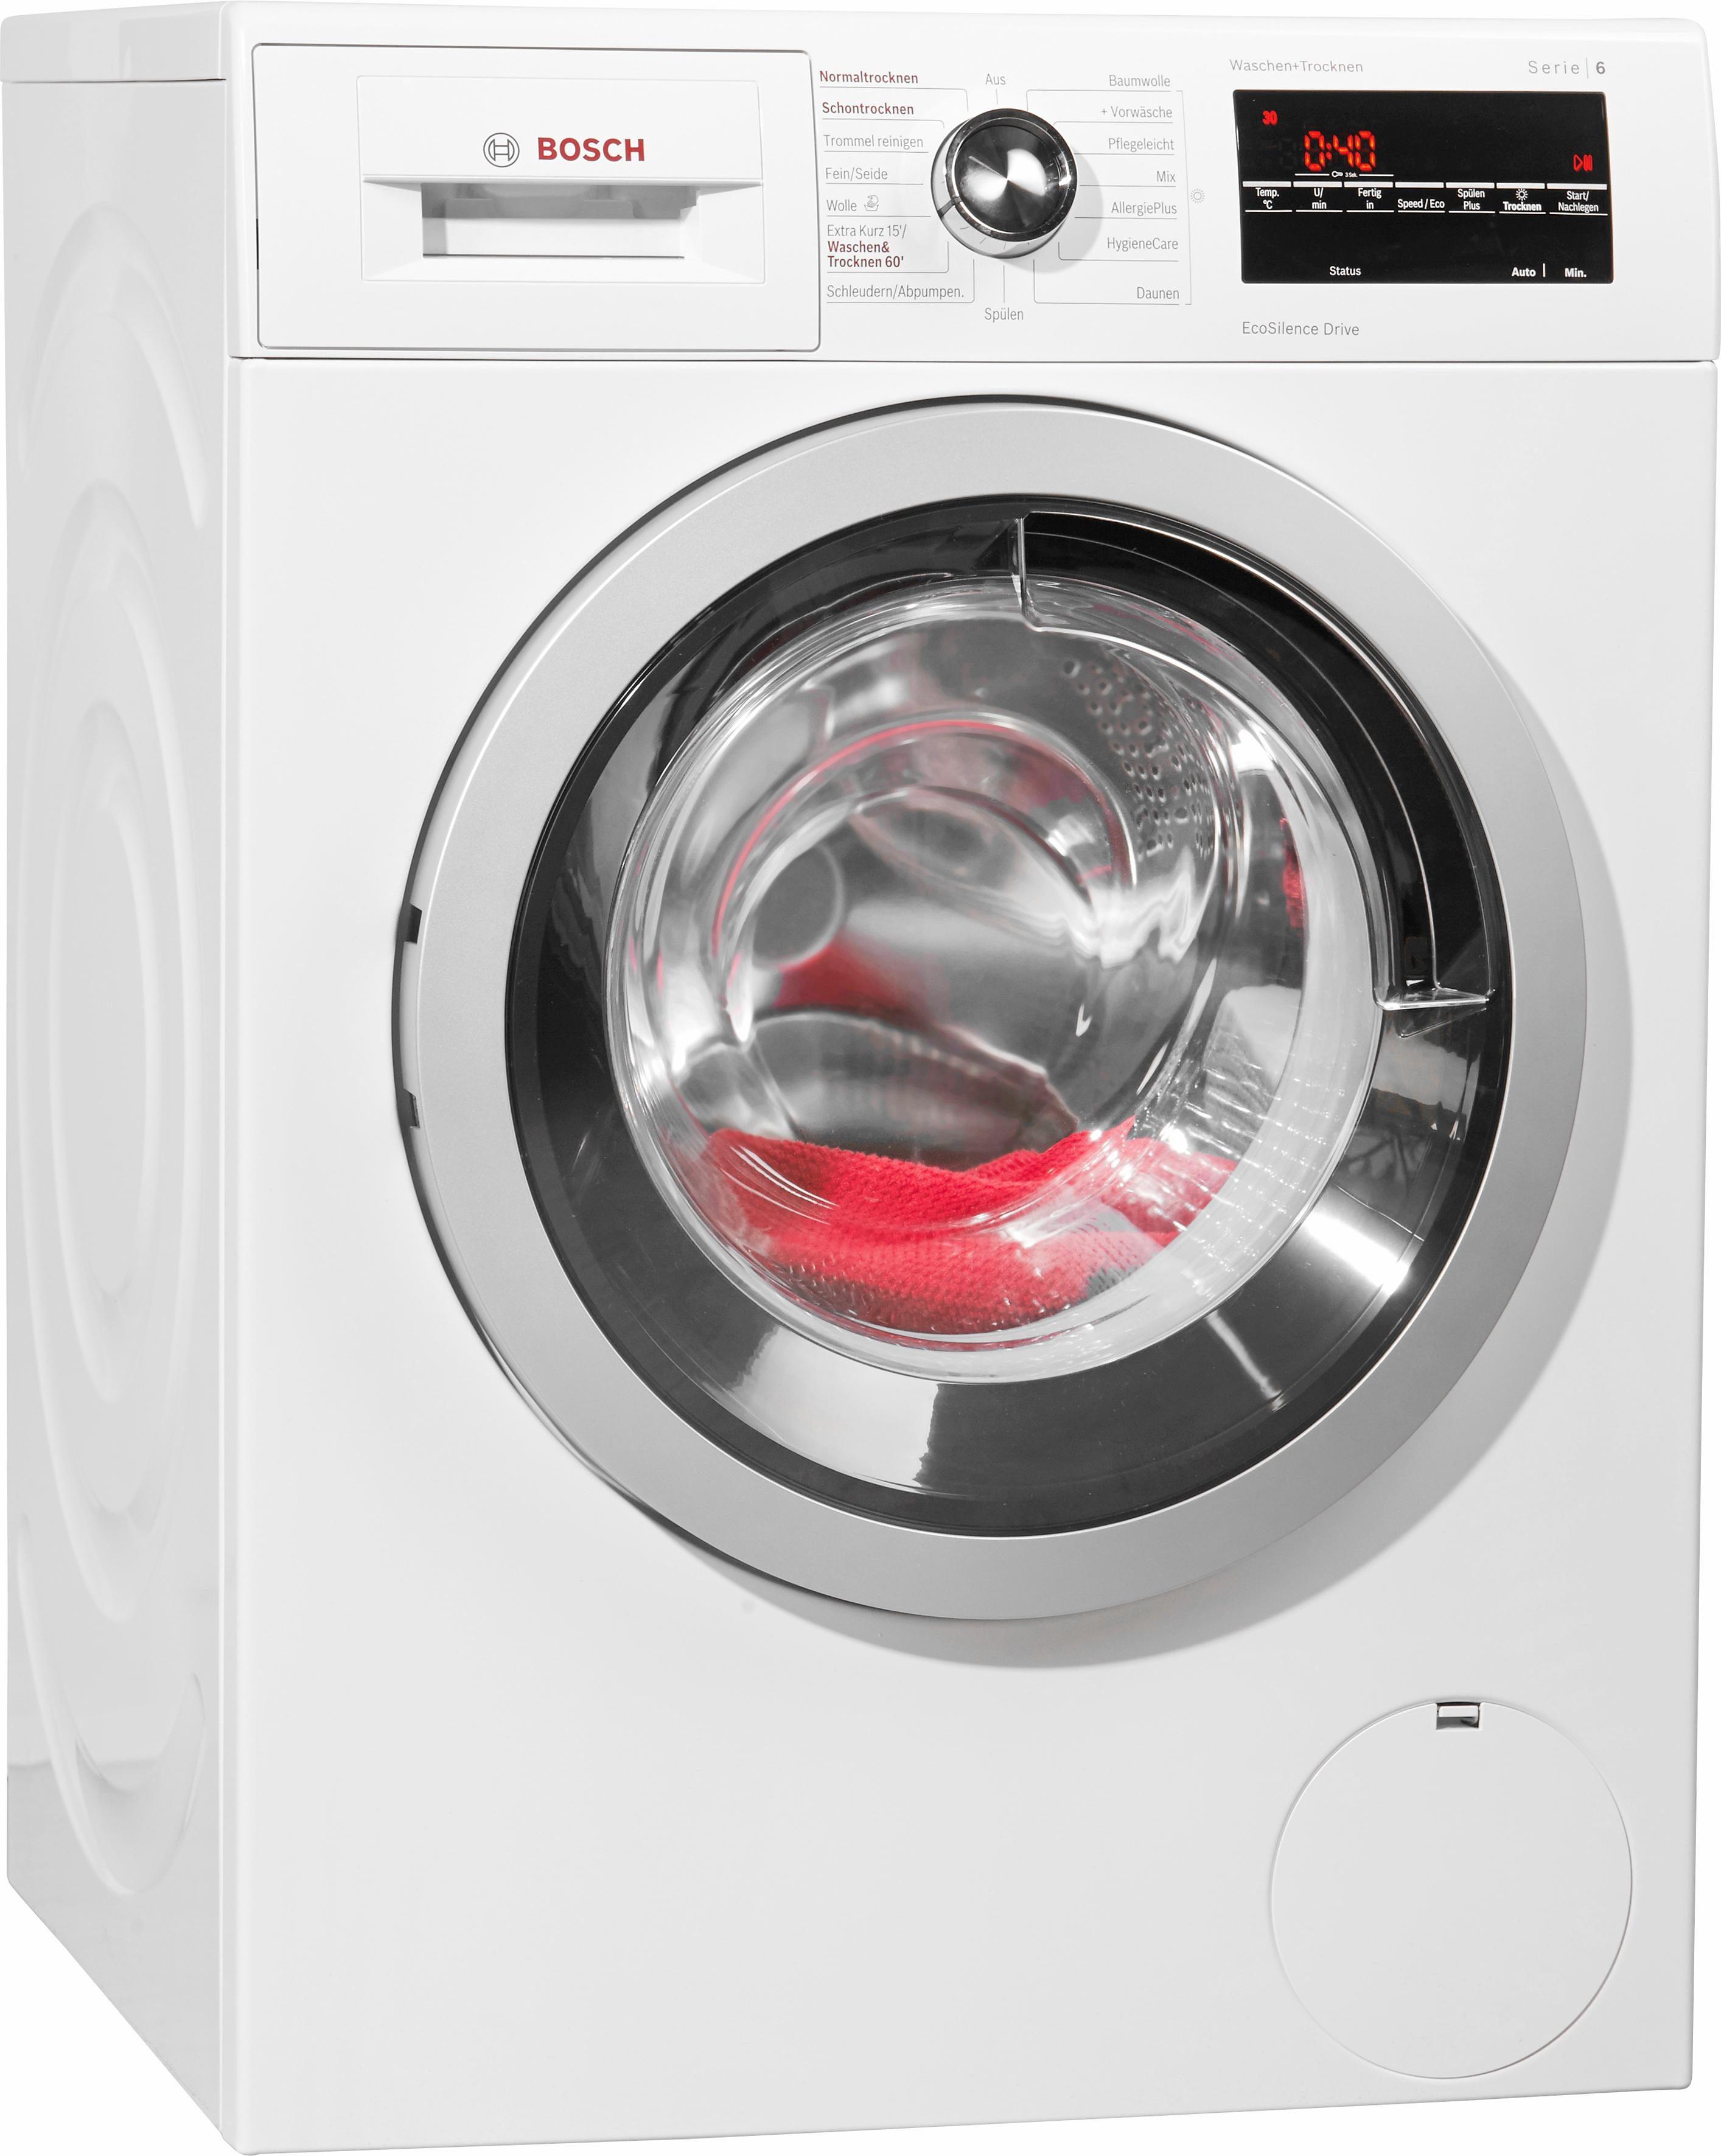 BOSCH Waschtrockner Serie 6 WVG30442, A, 8 kg / 5 kg, 1.500 U/Min